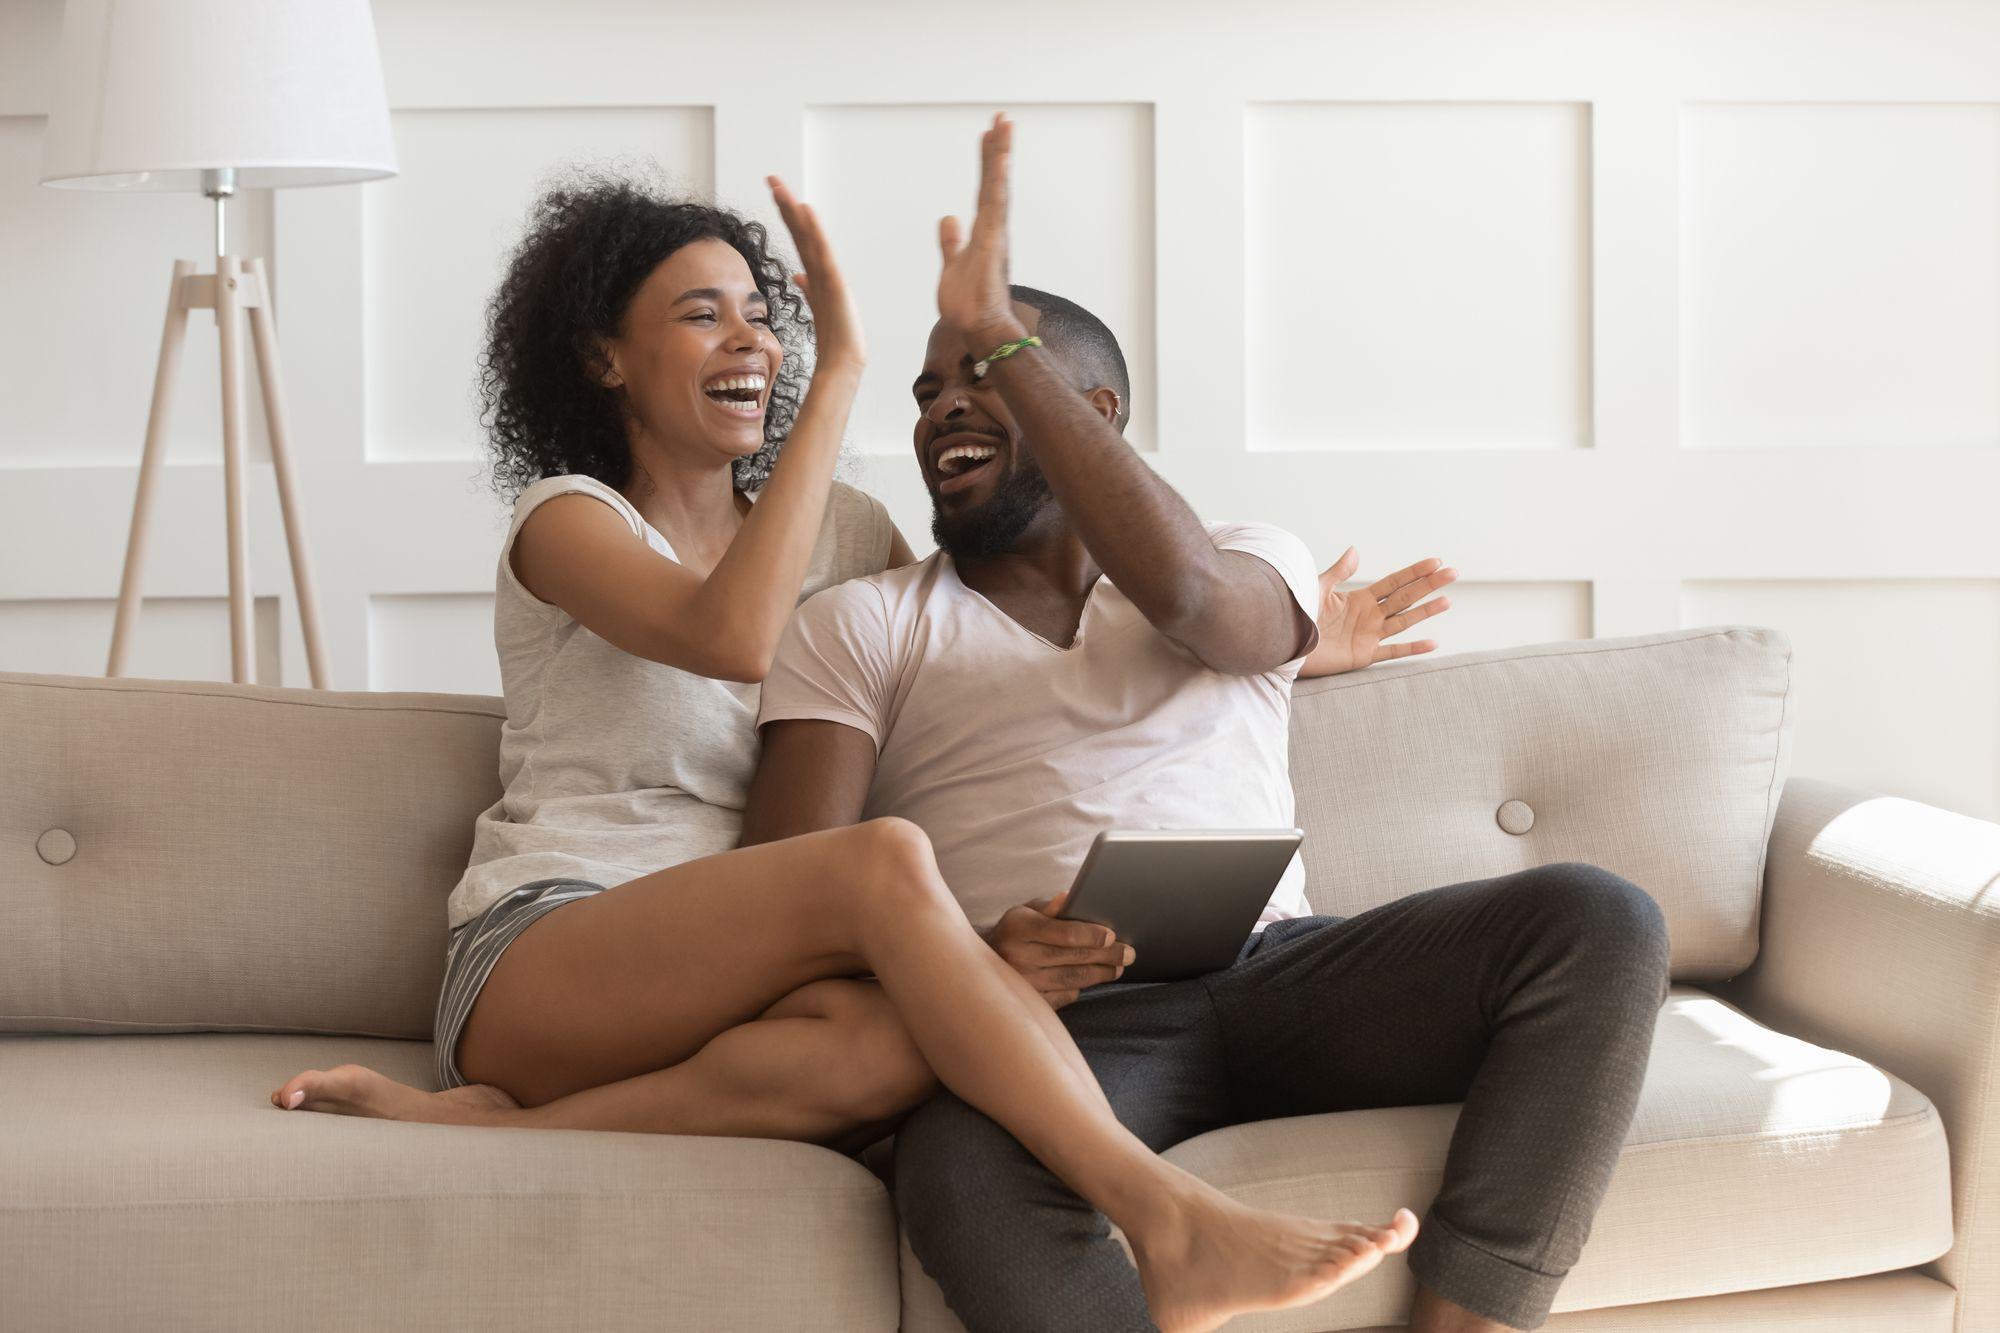 How to send successful HomeExchange swap requests